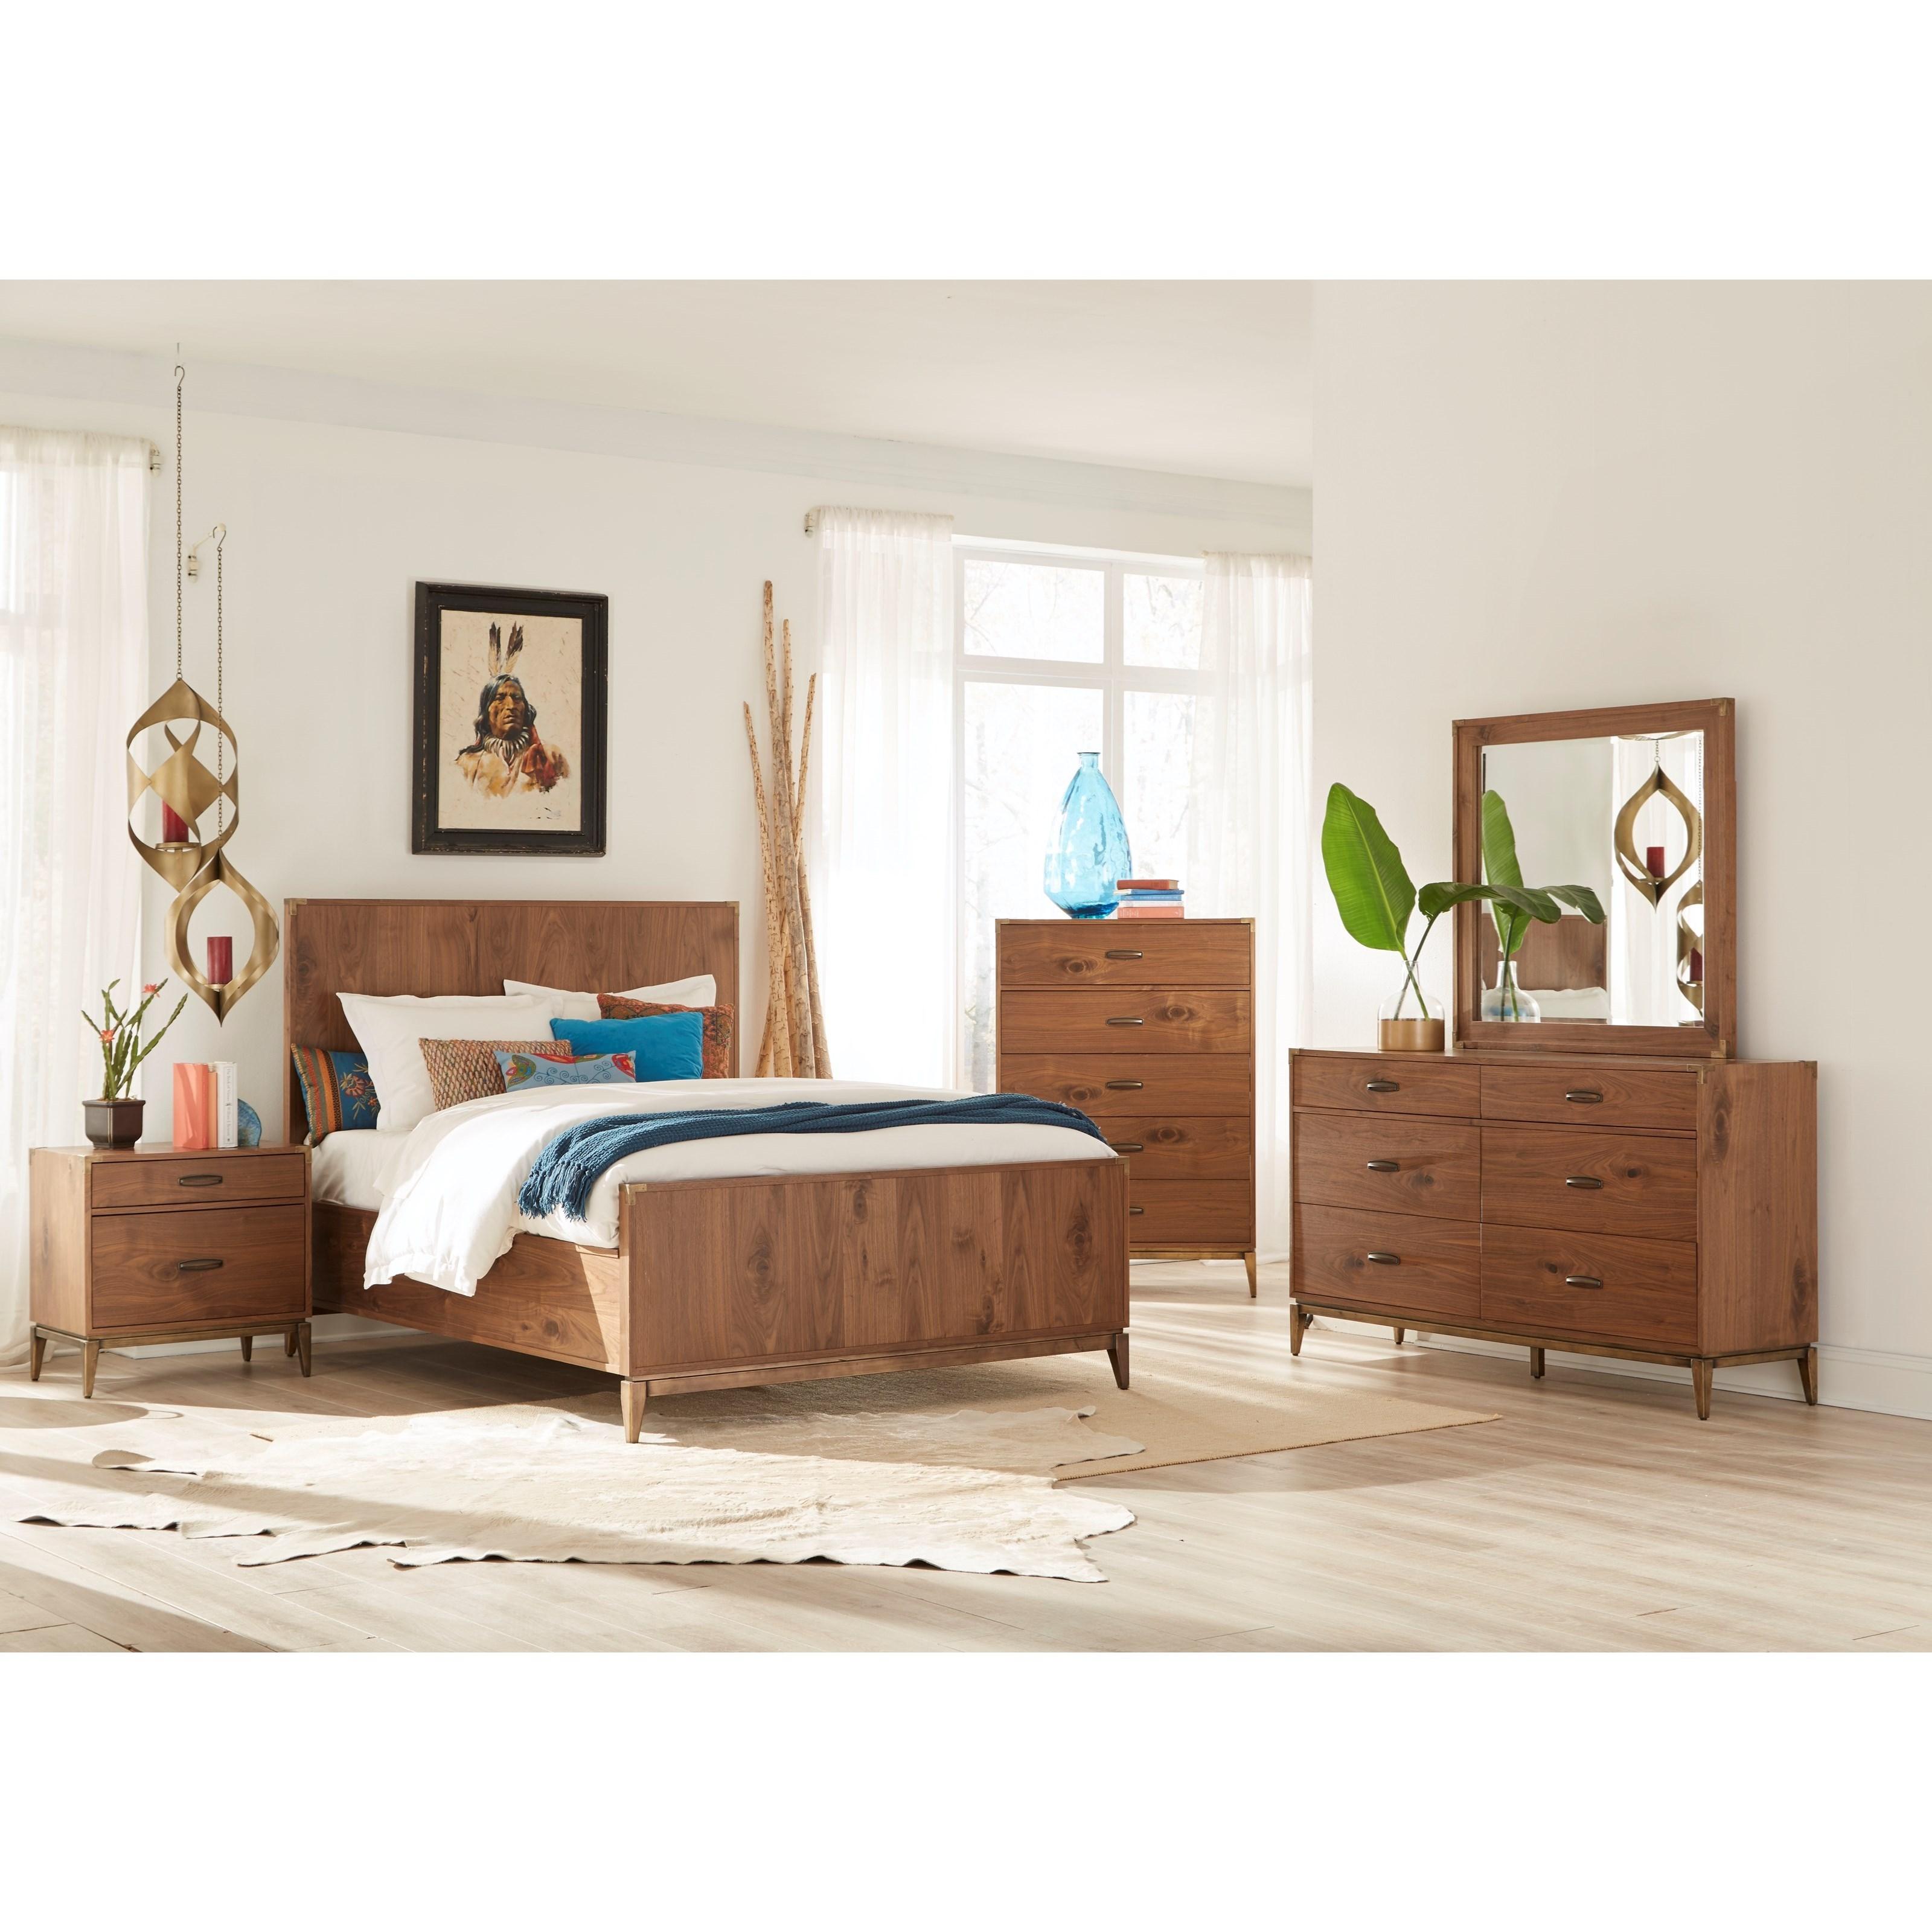 Adler Queen Bedroom Group by Modus International at A1 Furniture & Mattress